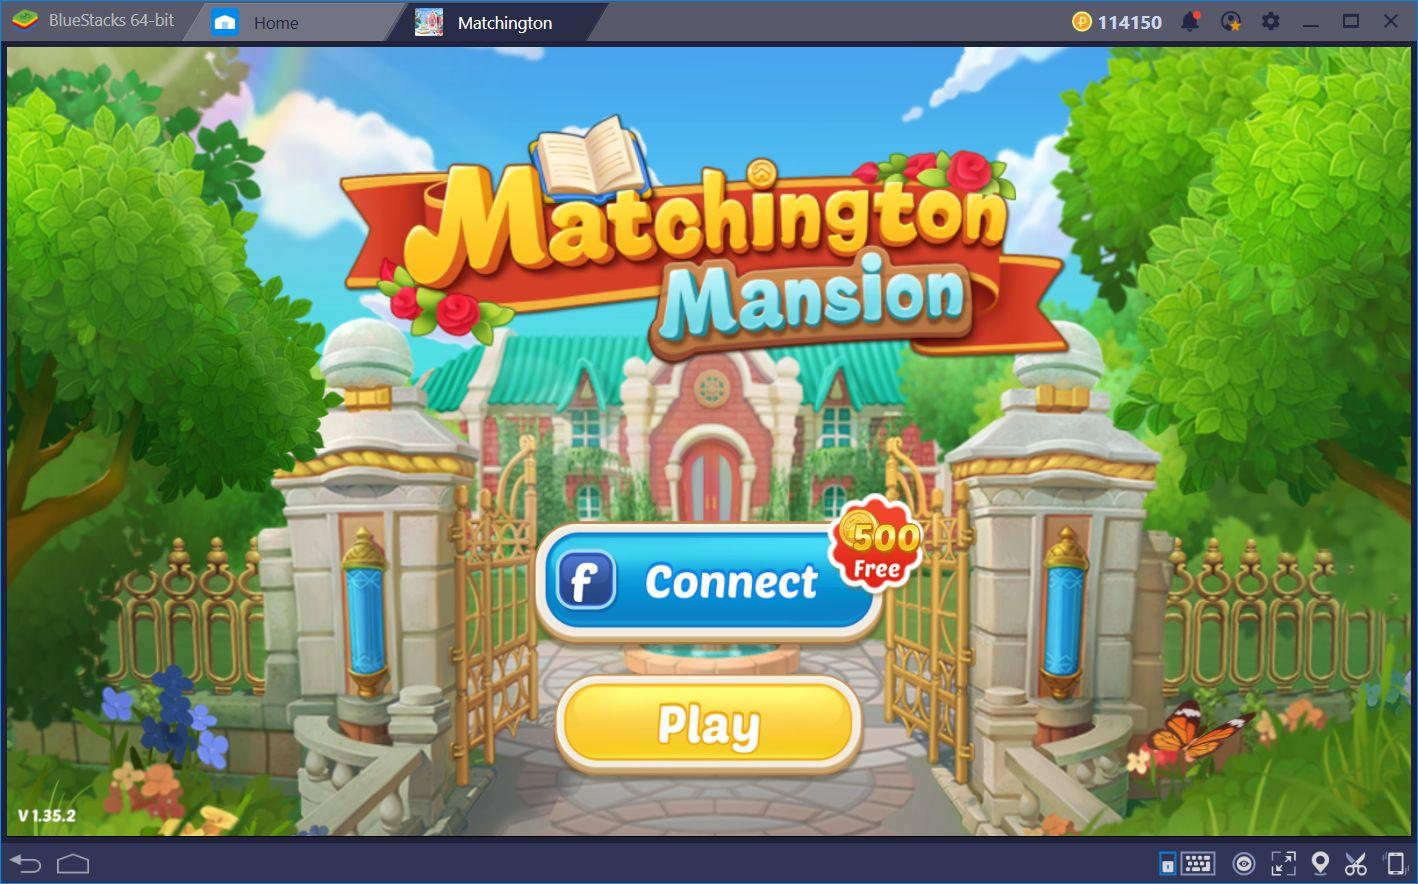 Matchington Mansion—Candy Crush Meets Building Sim